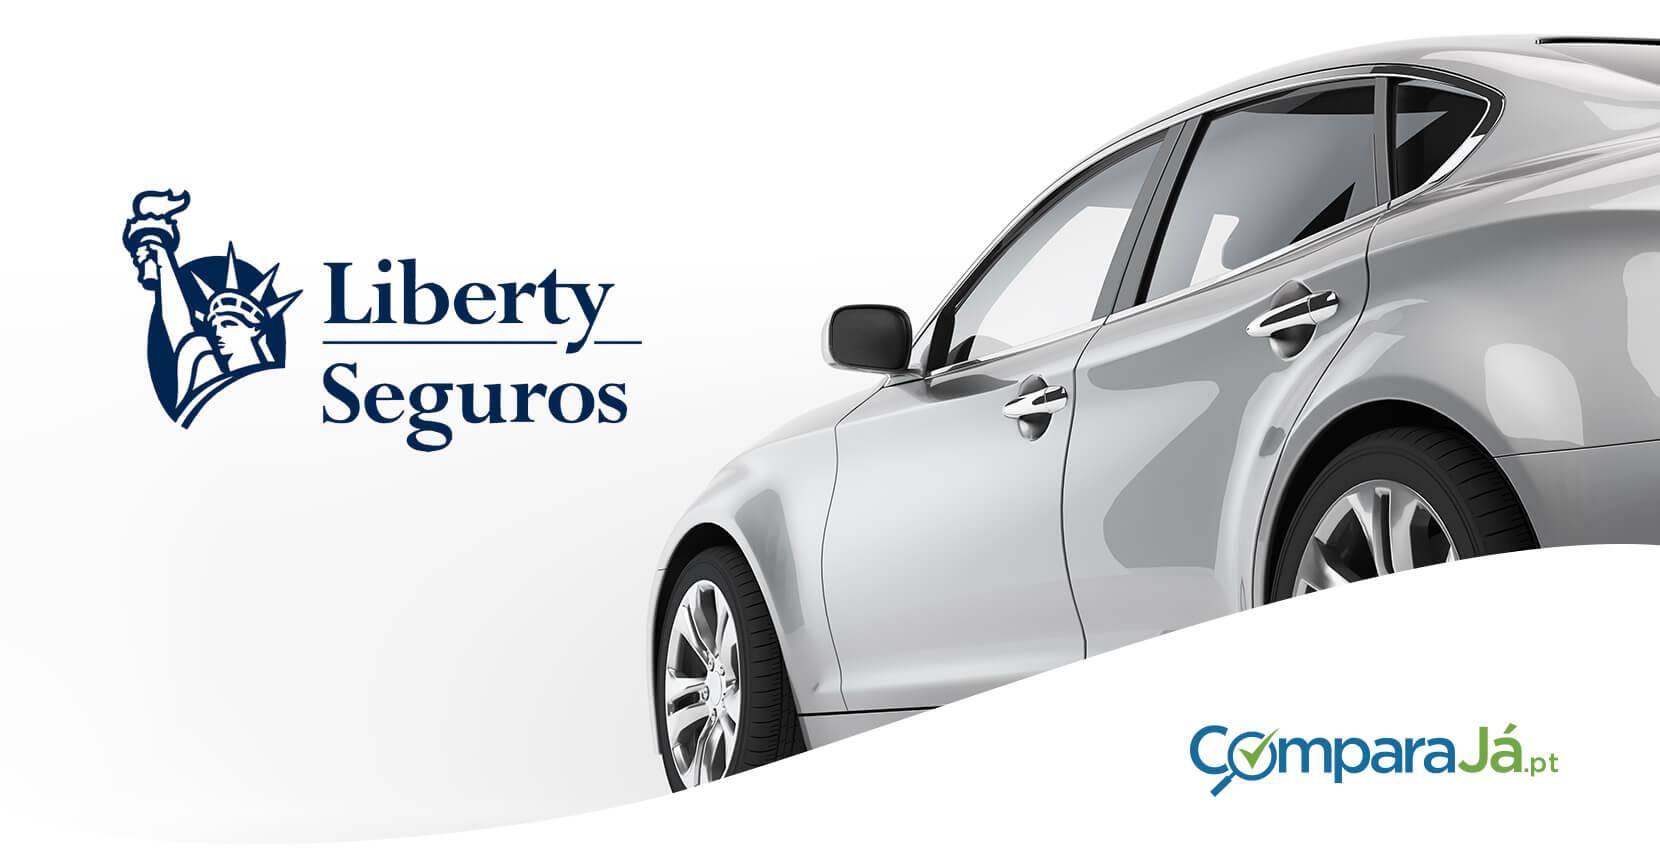 Seguro Automóvel Liberty: Impede o Veículo de Ser Roubado